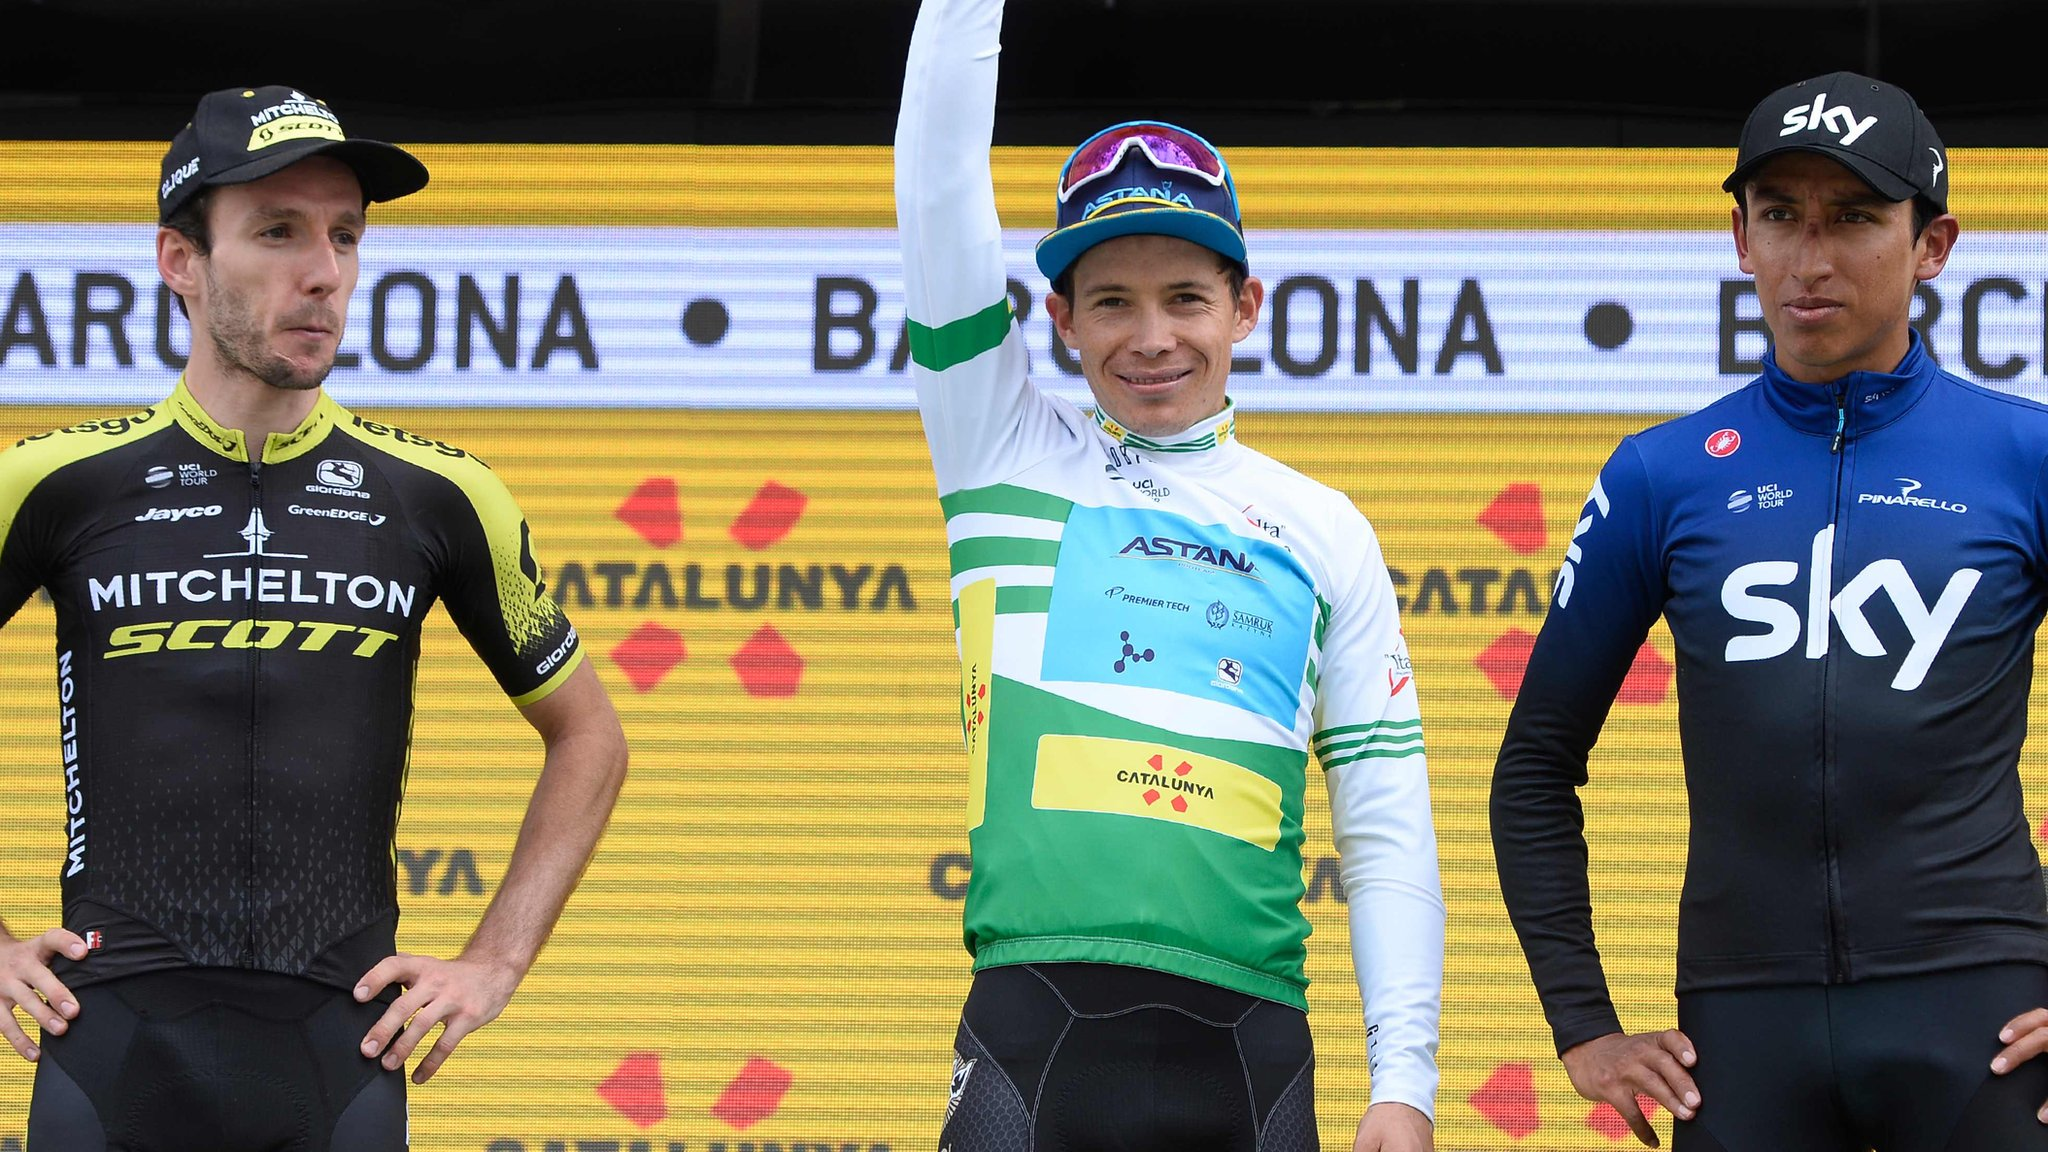 Yates finishes runner-up at Volta a Catalunya